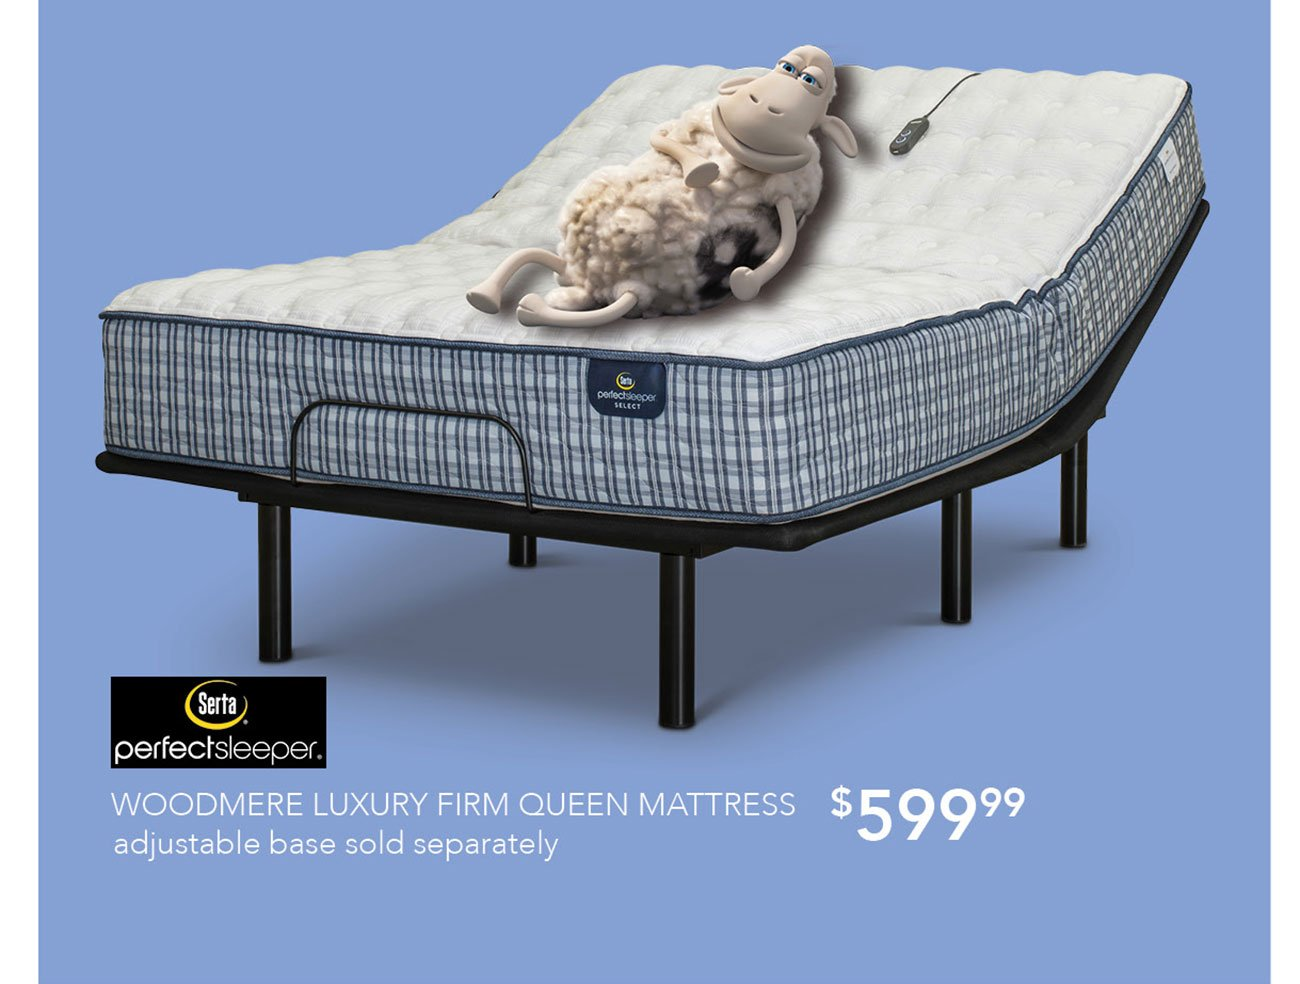 Serta-woodmere-queen-mattress